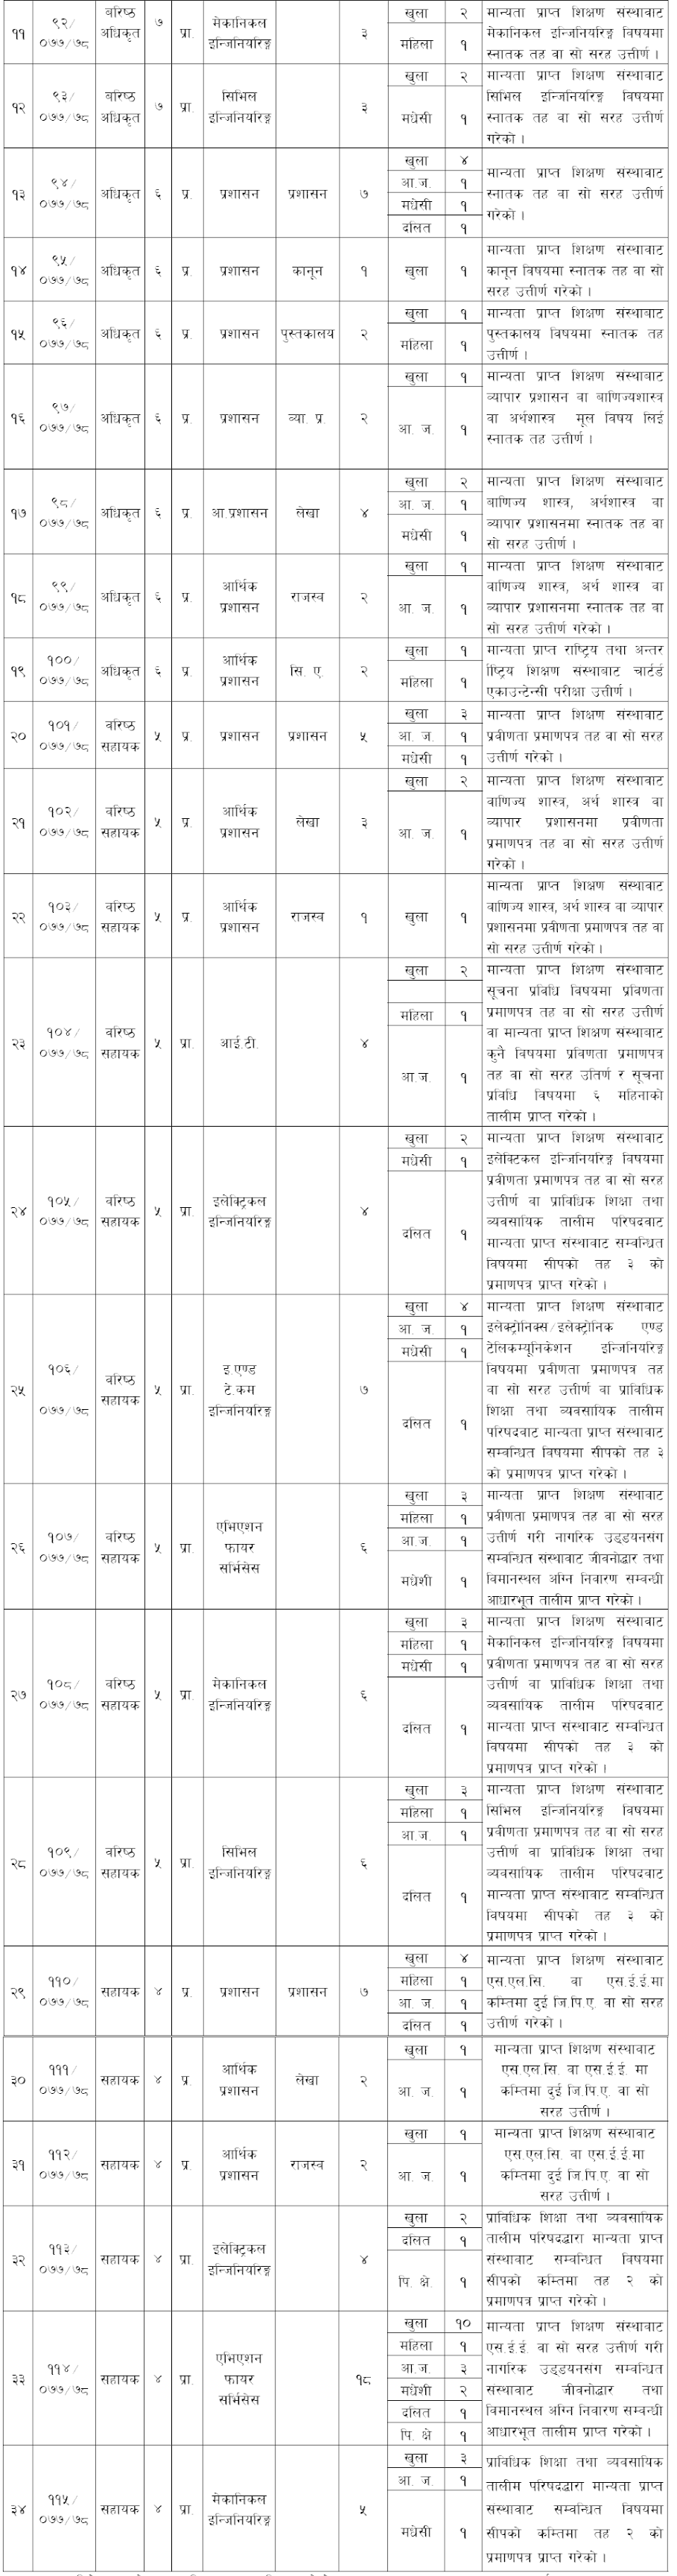 Civil Aviation Authority of Nepal (CAAN) Vacancy 2078